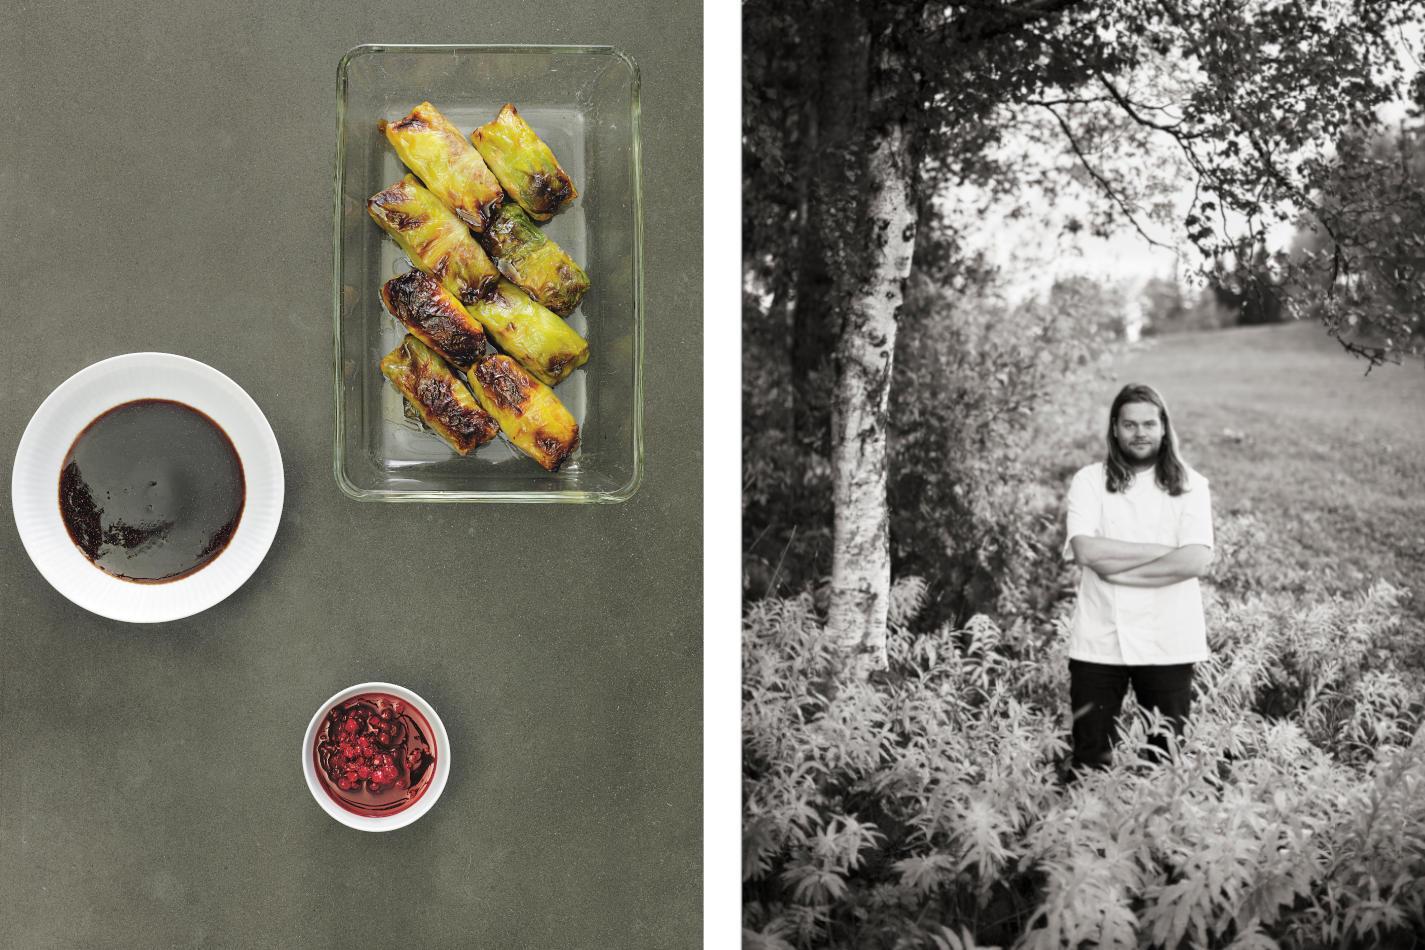 Magnus Nilsson | The Nordic Cookbook | Between candour and nostalgia | Scan Magazine